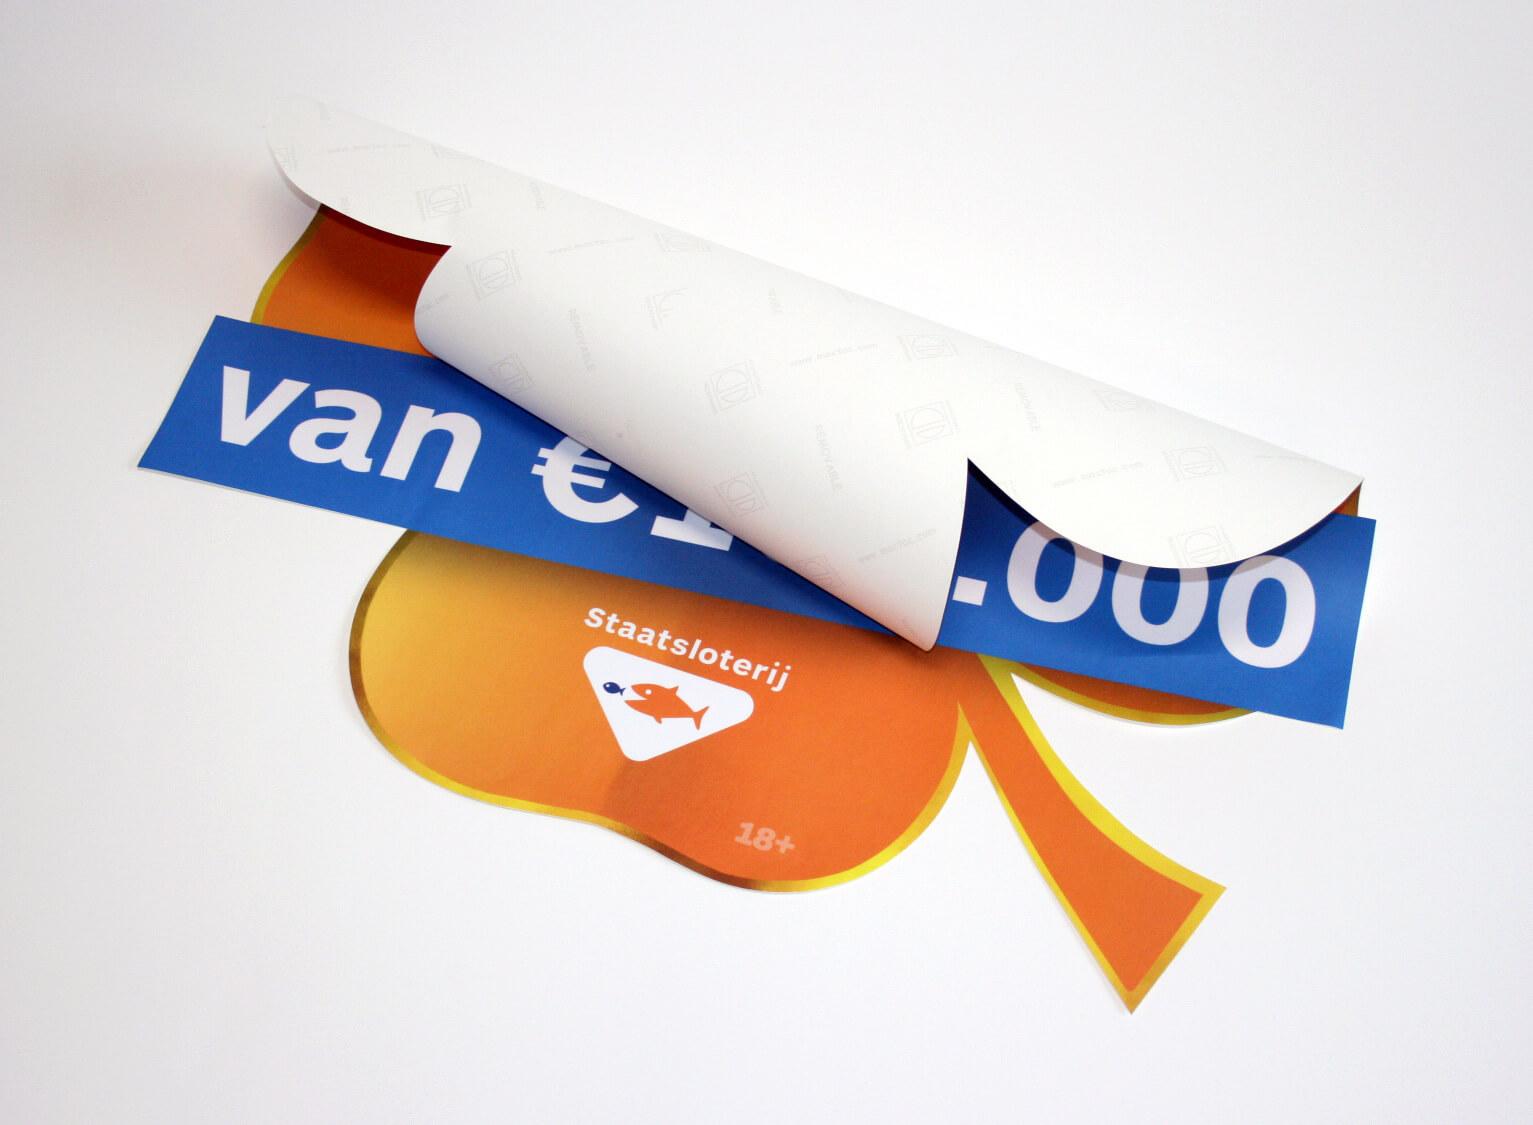 Vloerstickers anti slip laminaat